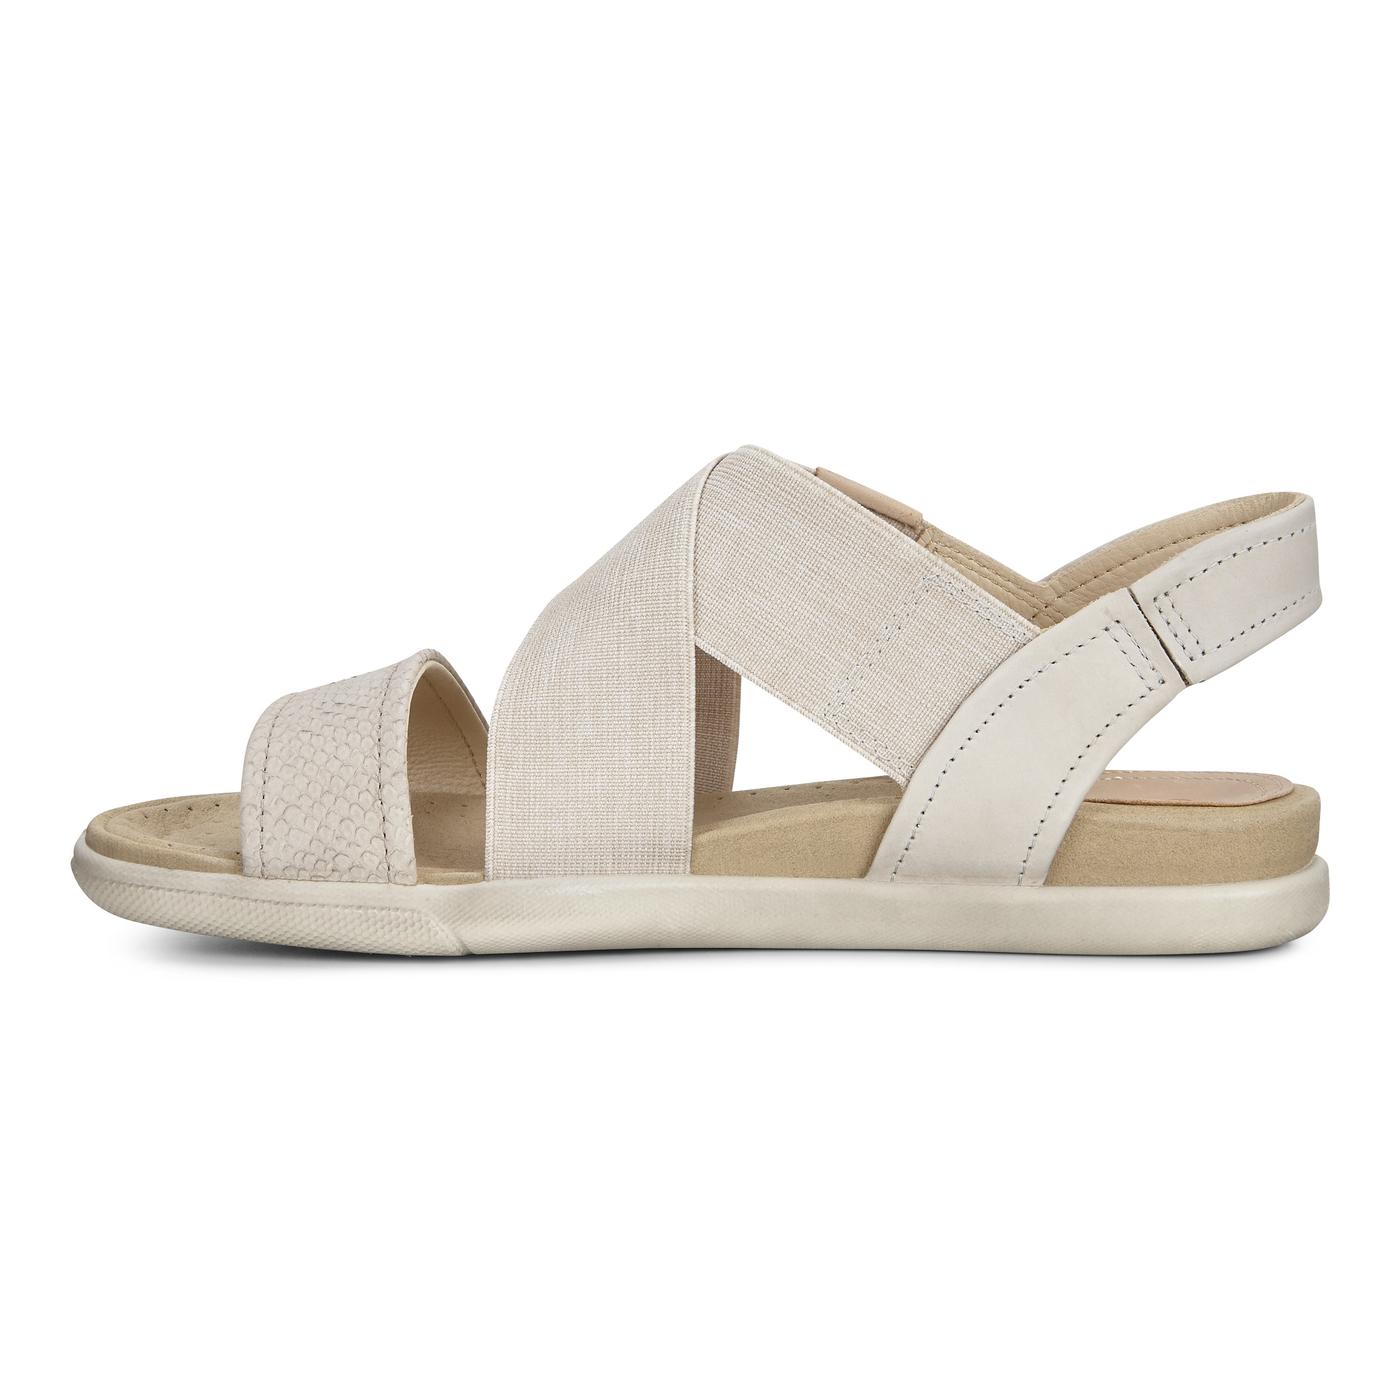 ECCO Damara 2 Strap Sandal